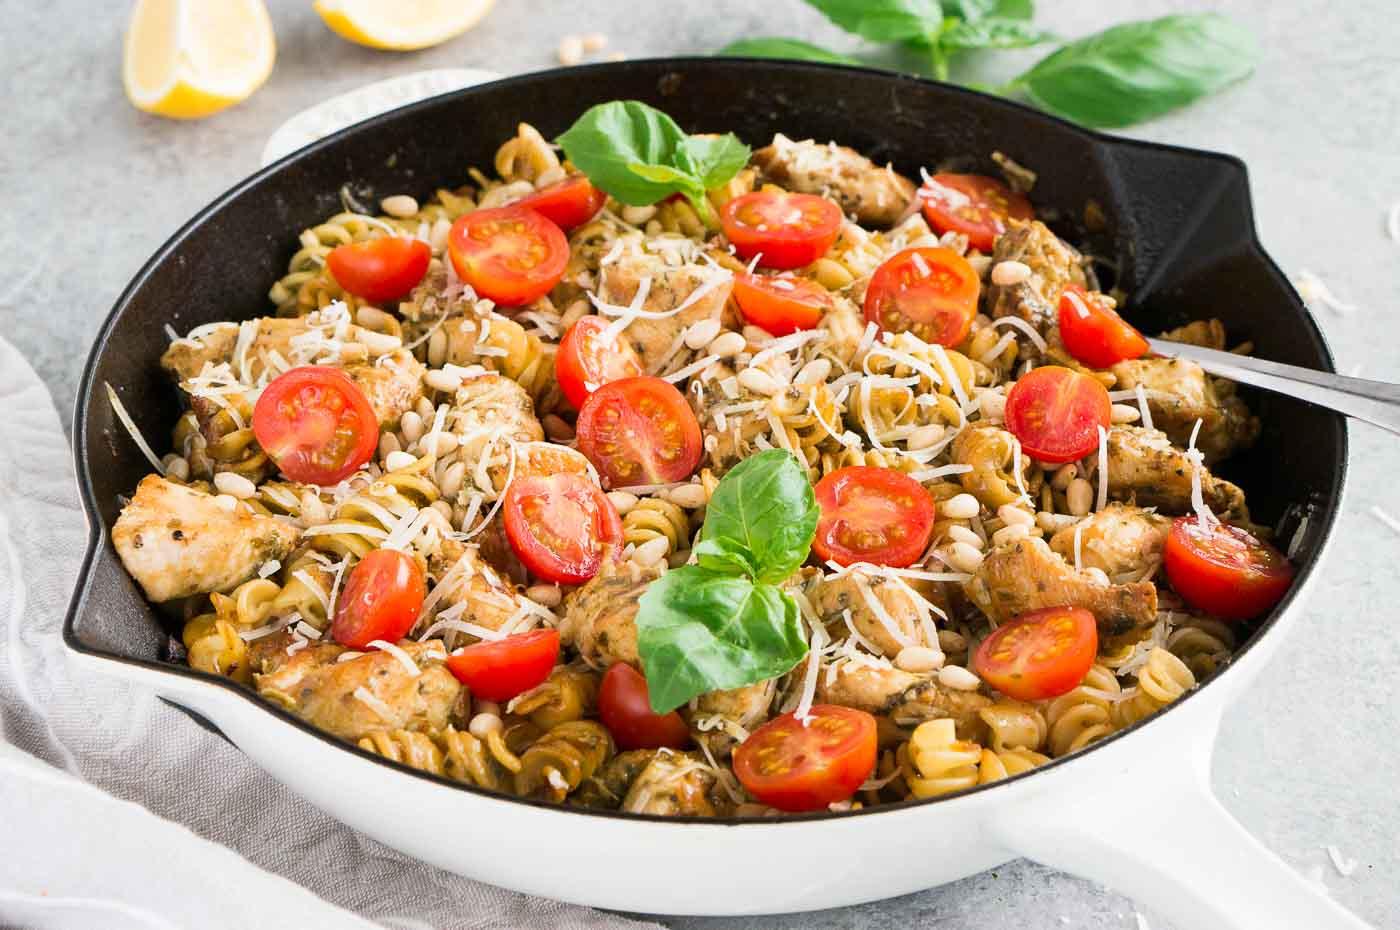 pesto pasta and chicken in a skillet